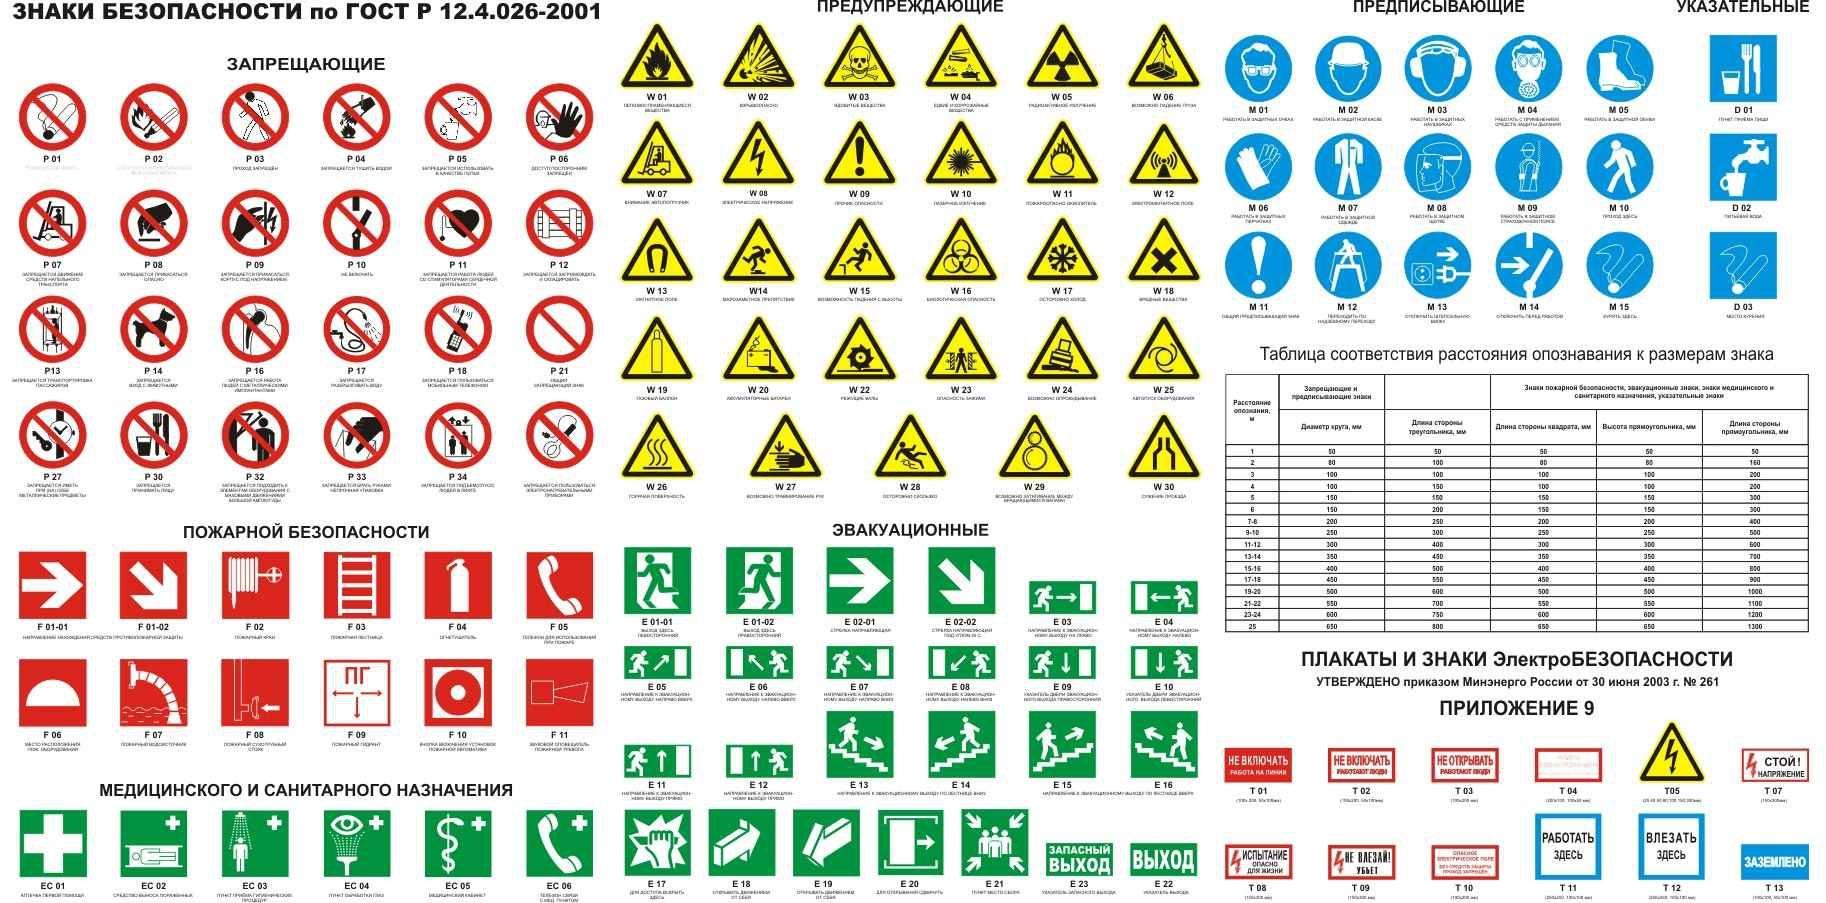 Знаки и плакаты безопасности ГОСТ Р 12.4.026-2001, знаки пожарной безопасности НПБ-160-97